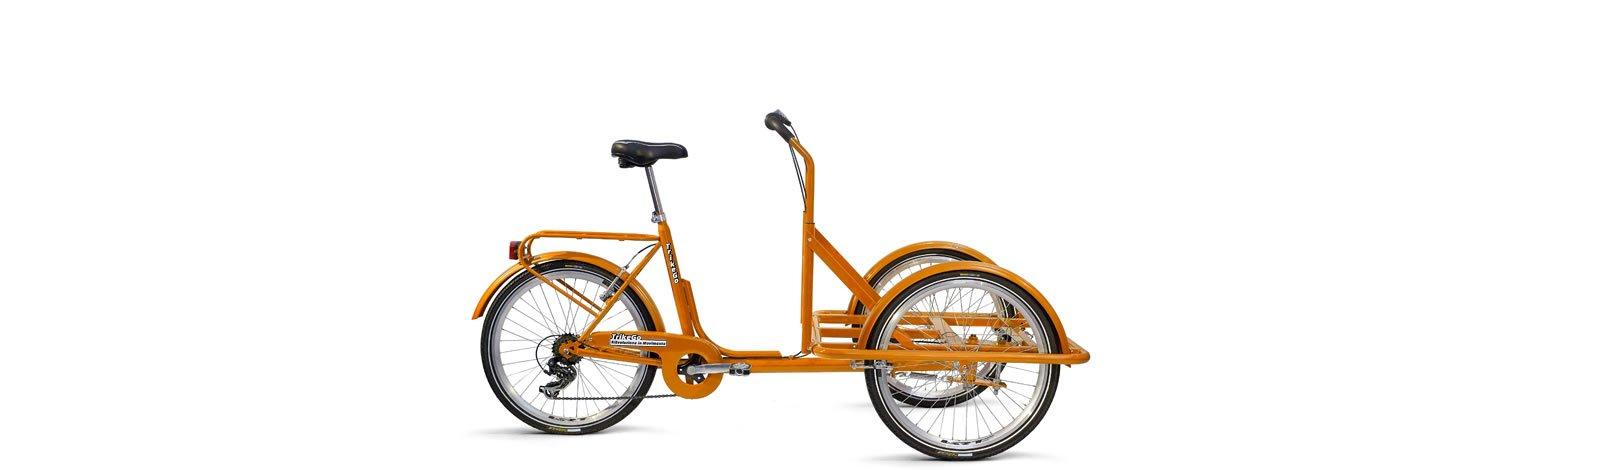 TrikeGo Cargobike- solo telaio - arancione